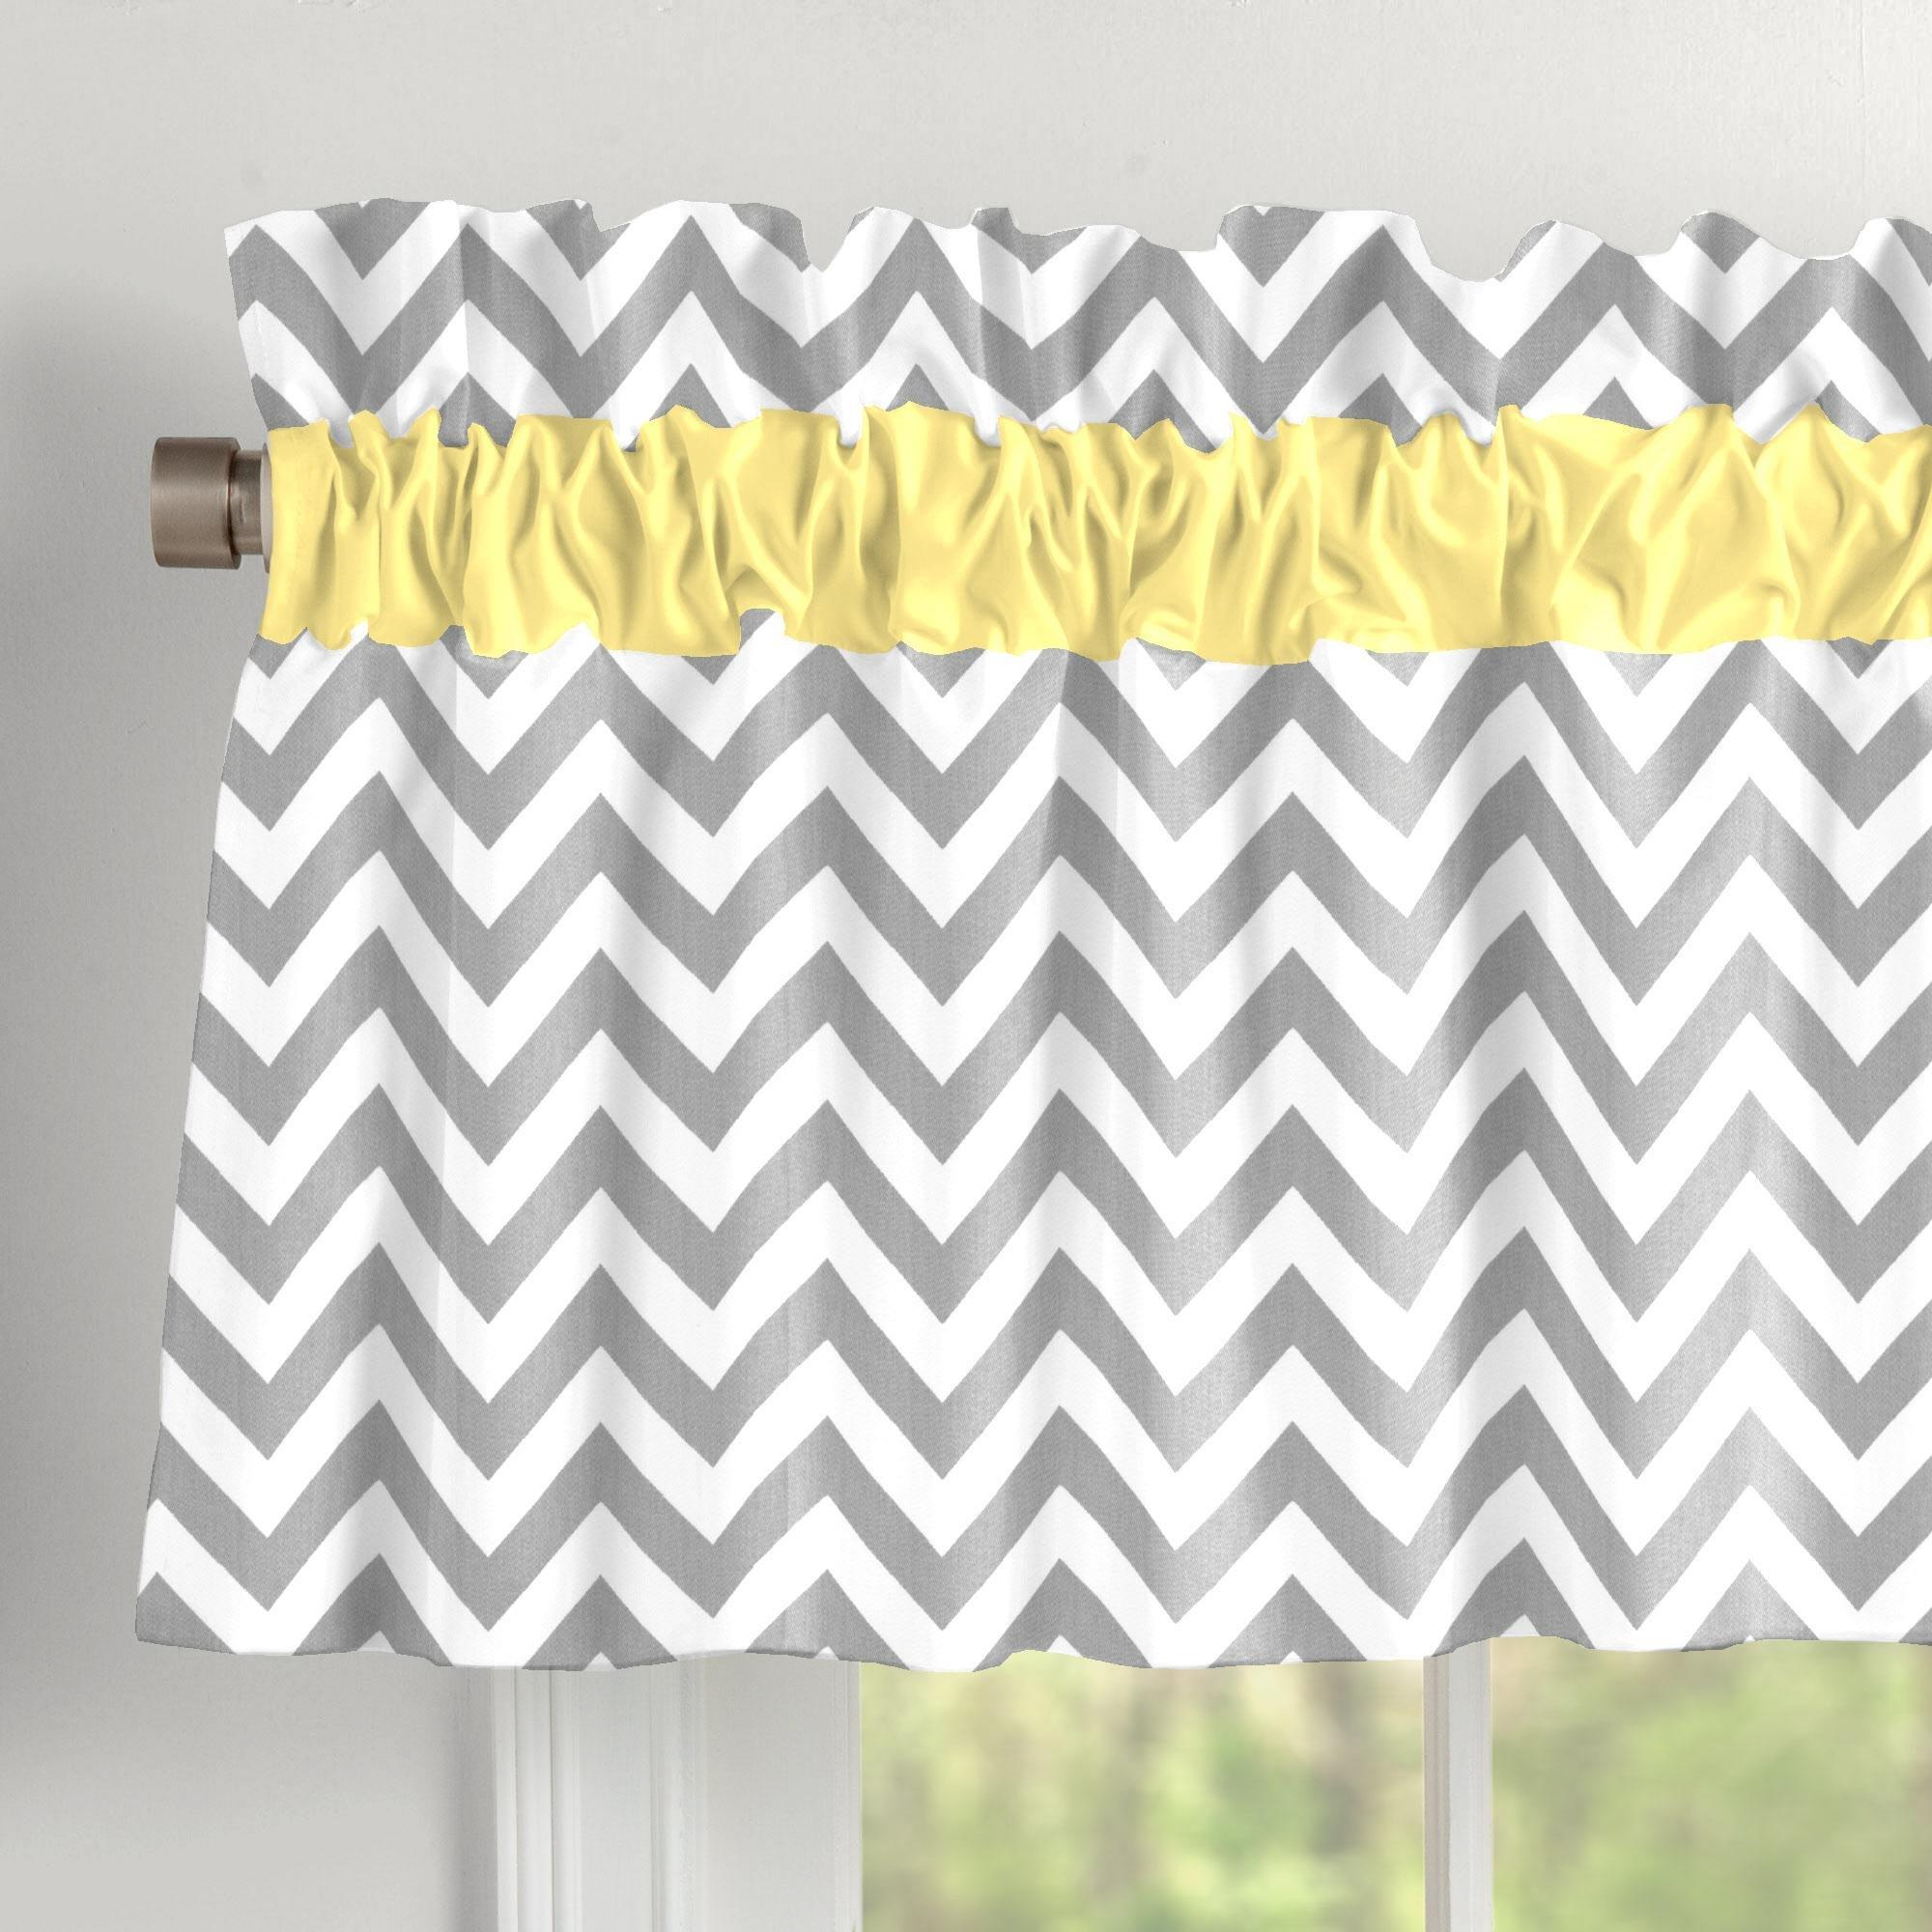 Carousel Designs Gray and Yellow Zig Zag Window Valance Rod Pocket